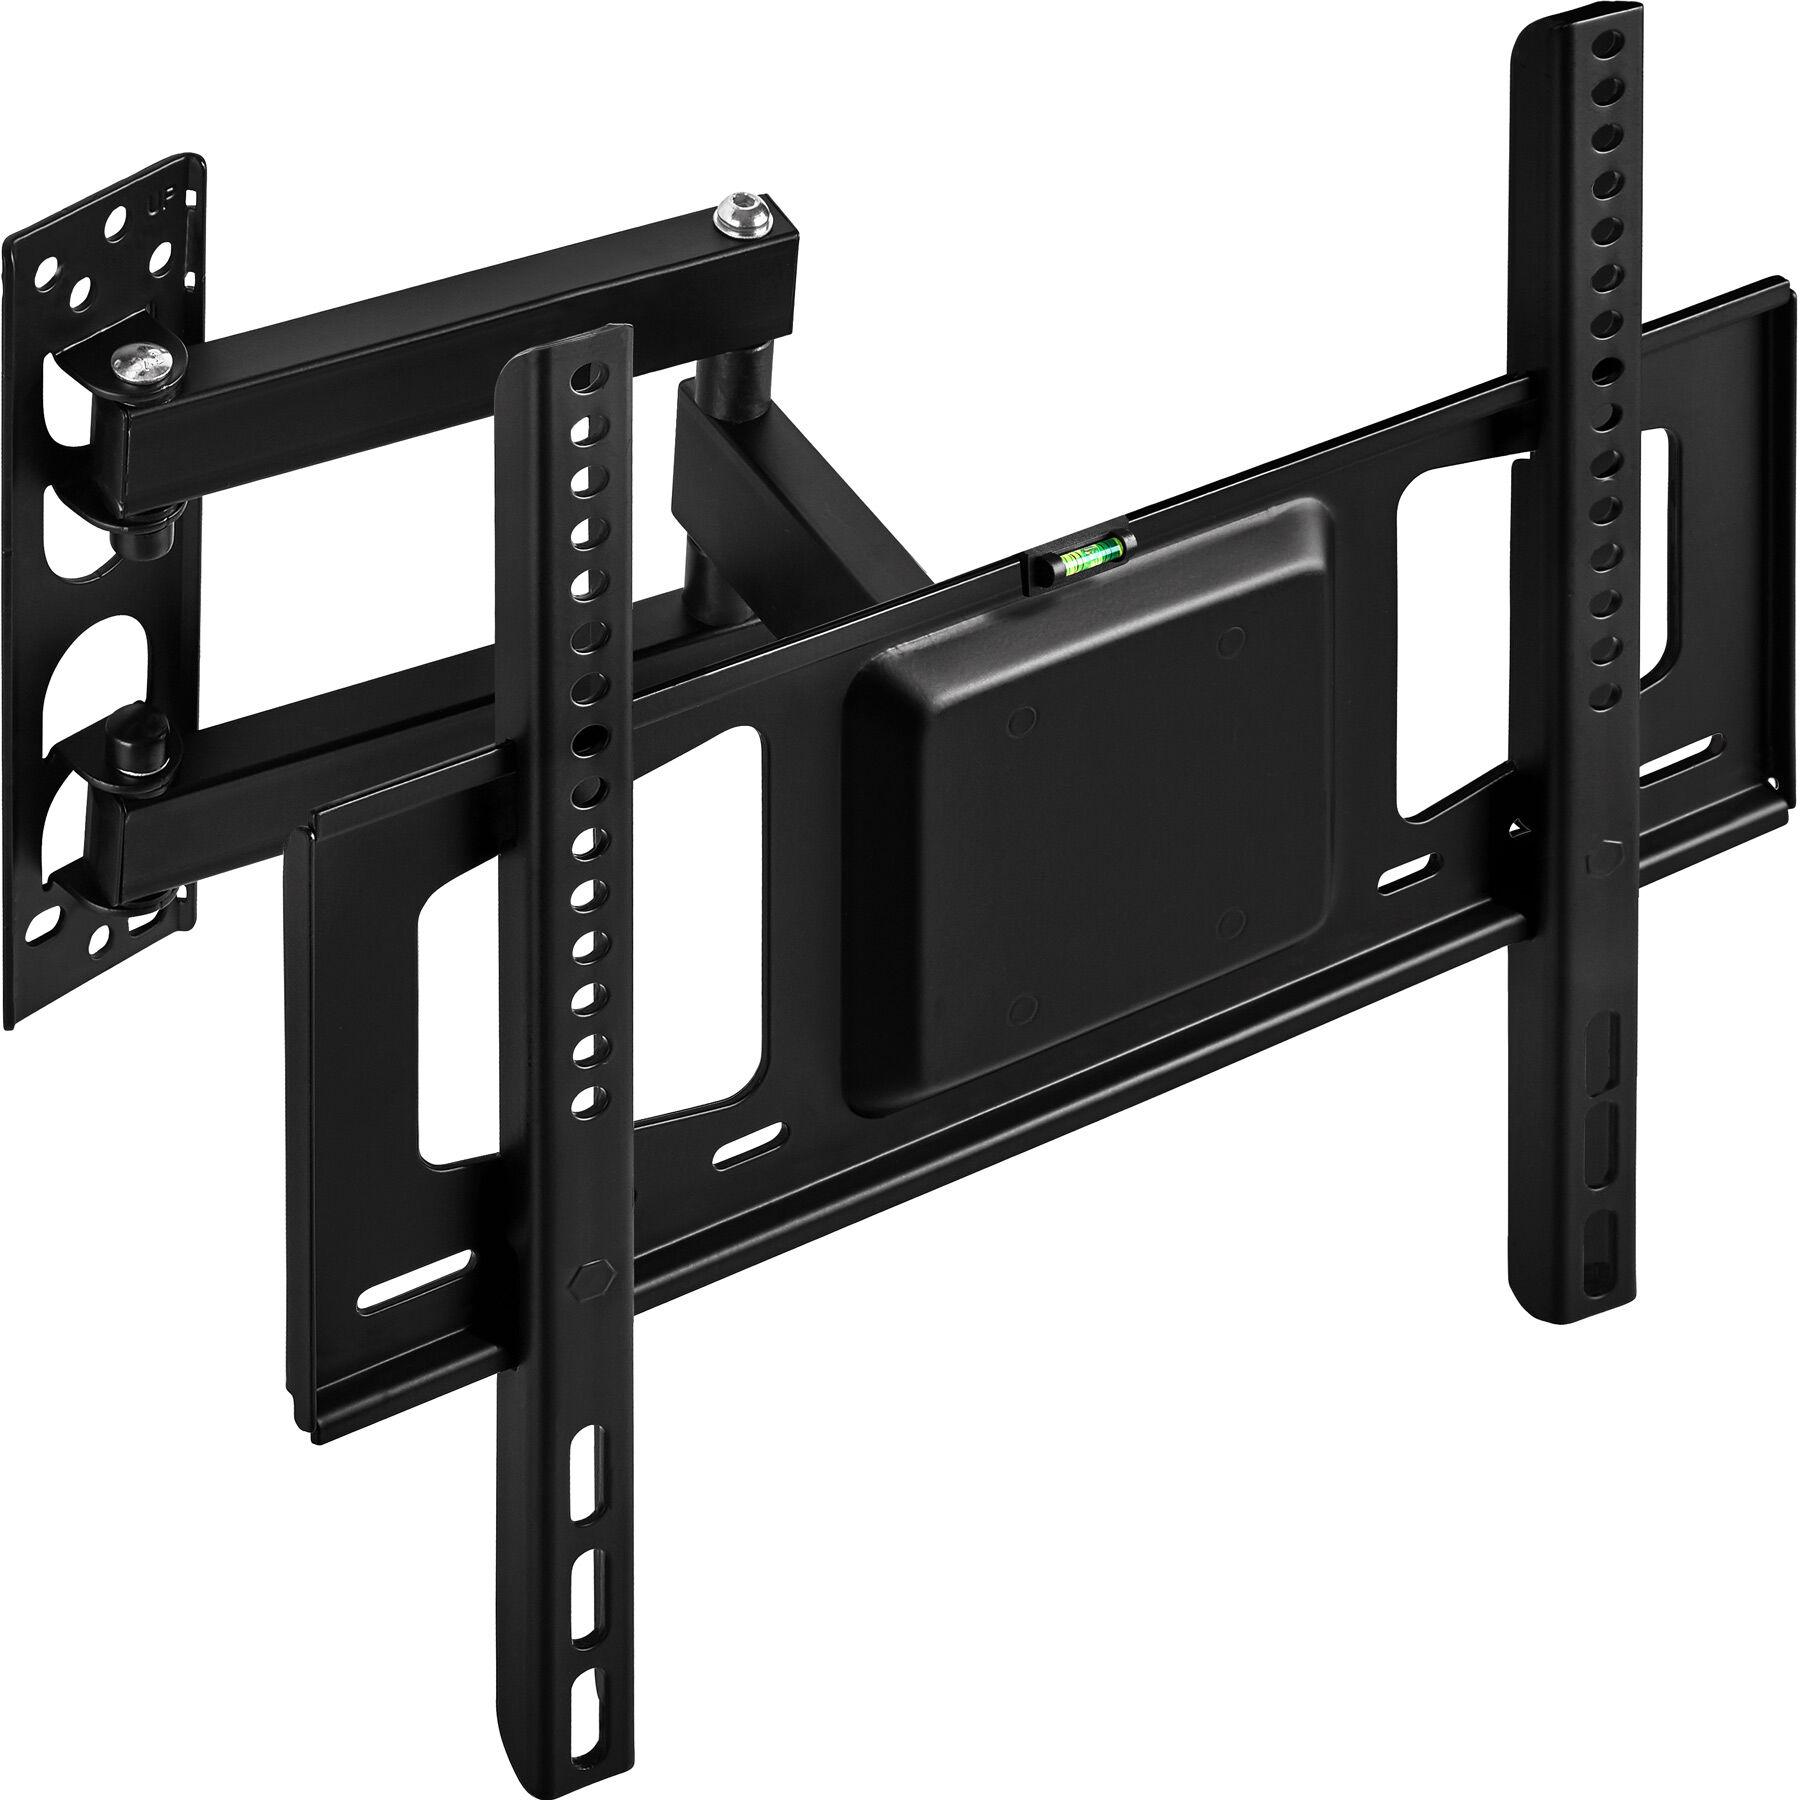 tectake TV wall mount for 26-55″ swivel and tilt function VESA standards 200 x 100-400 x 400 - black